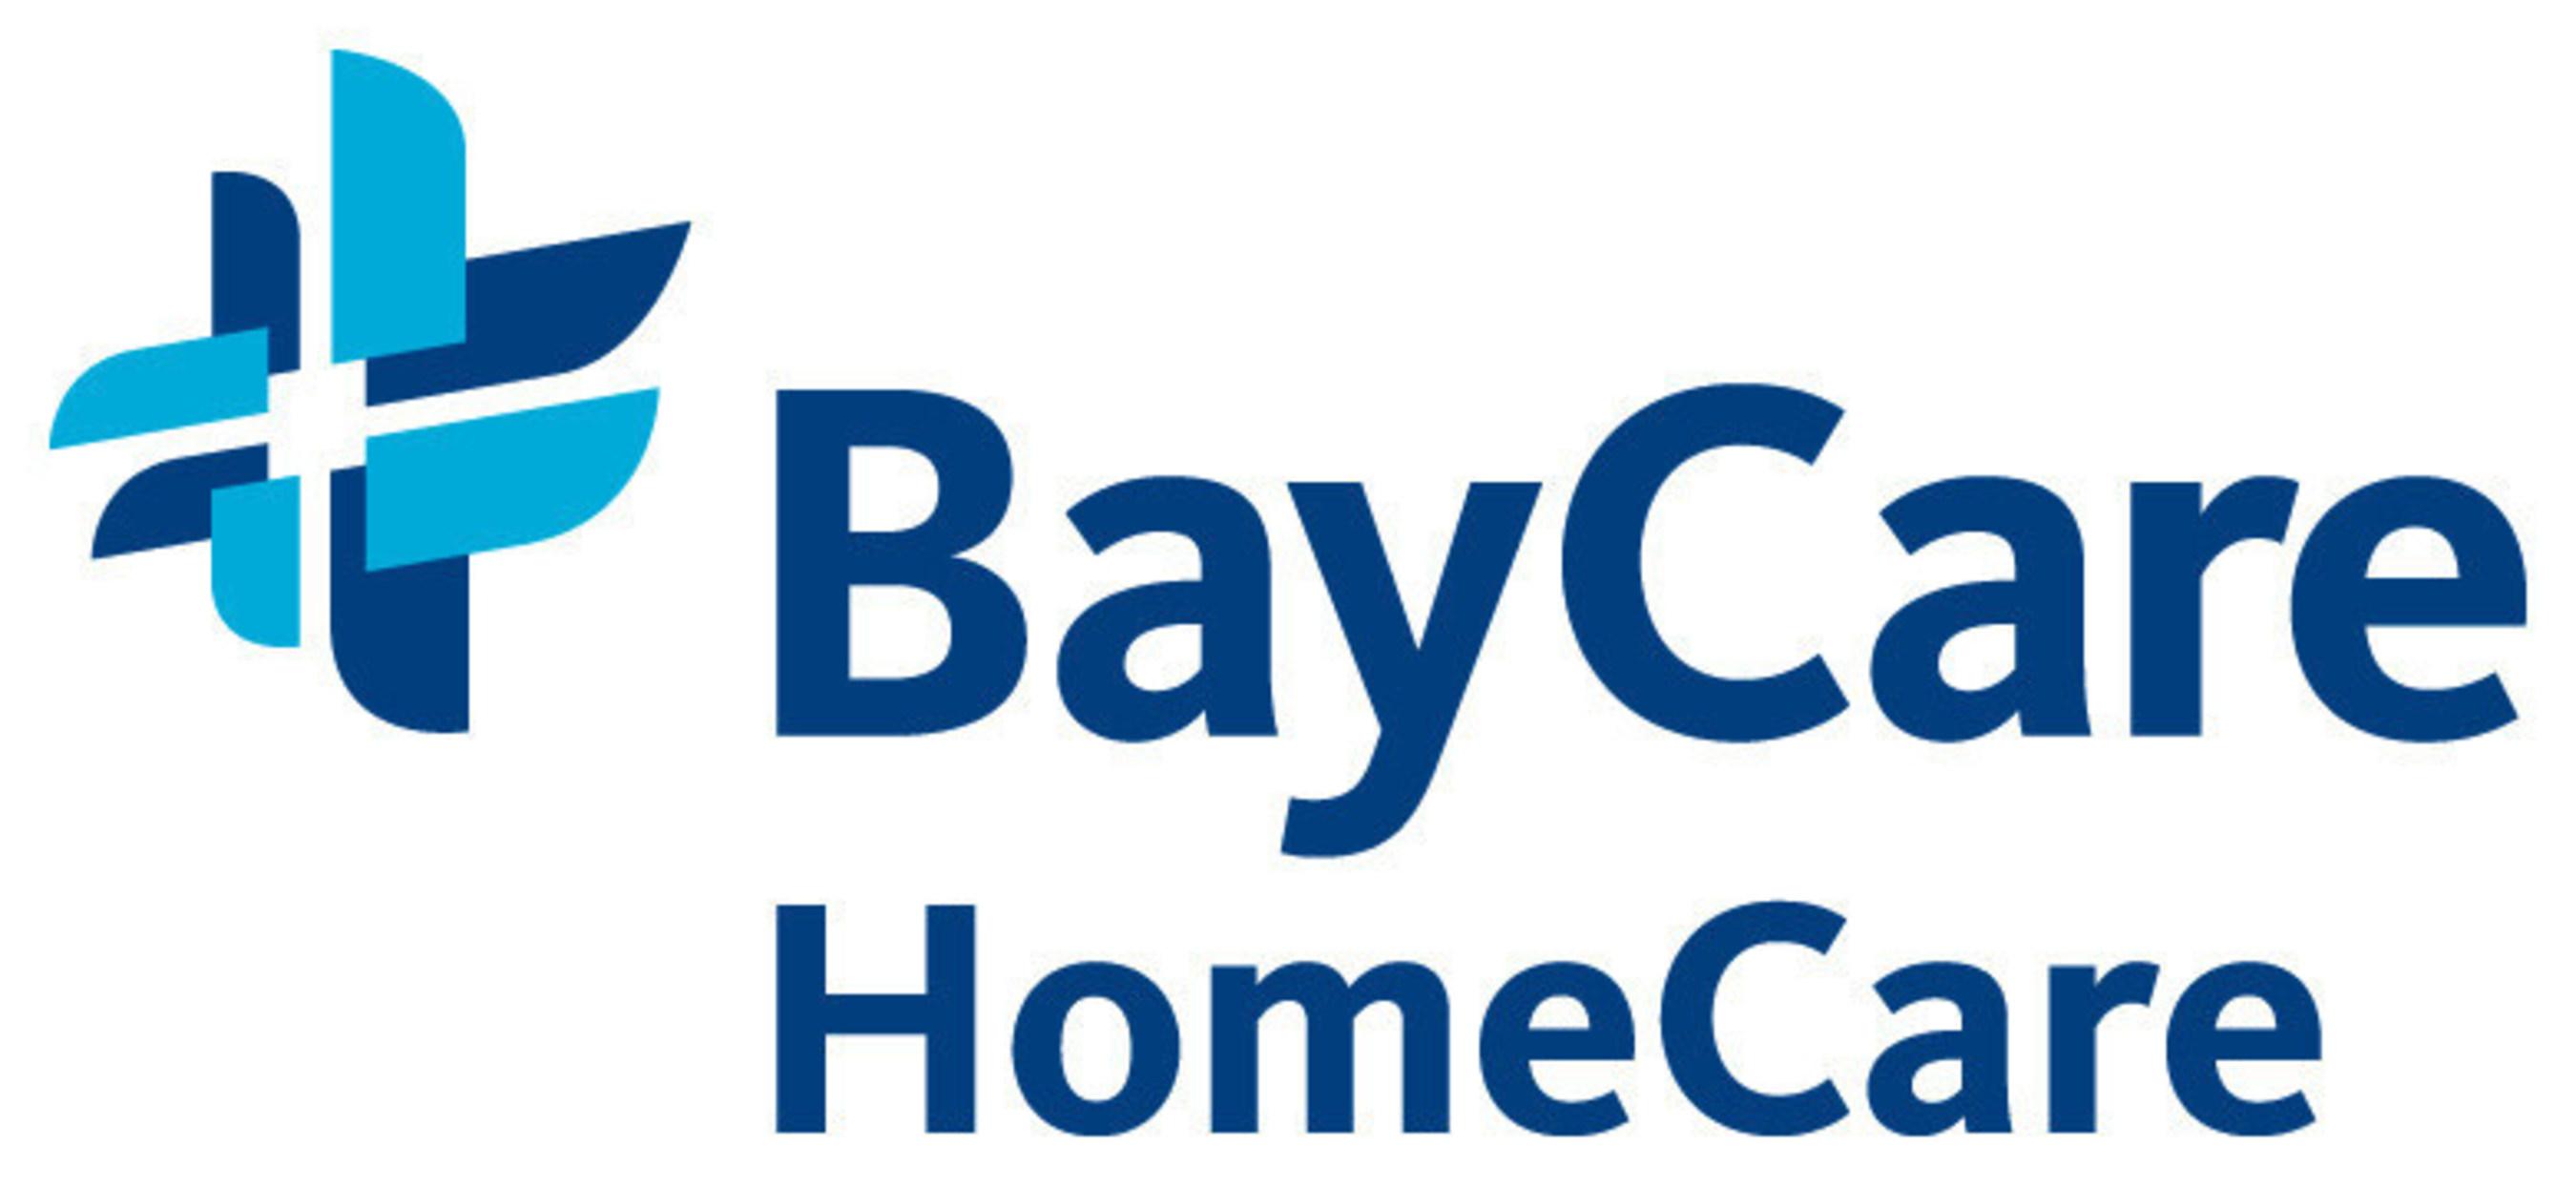 BayCare HomeCare Named to 2014 HomeCare Elite on